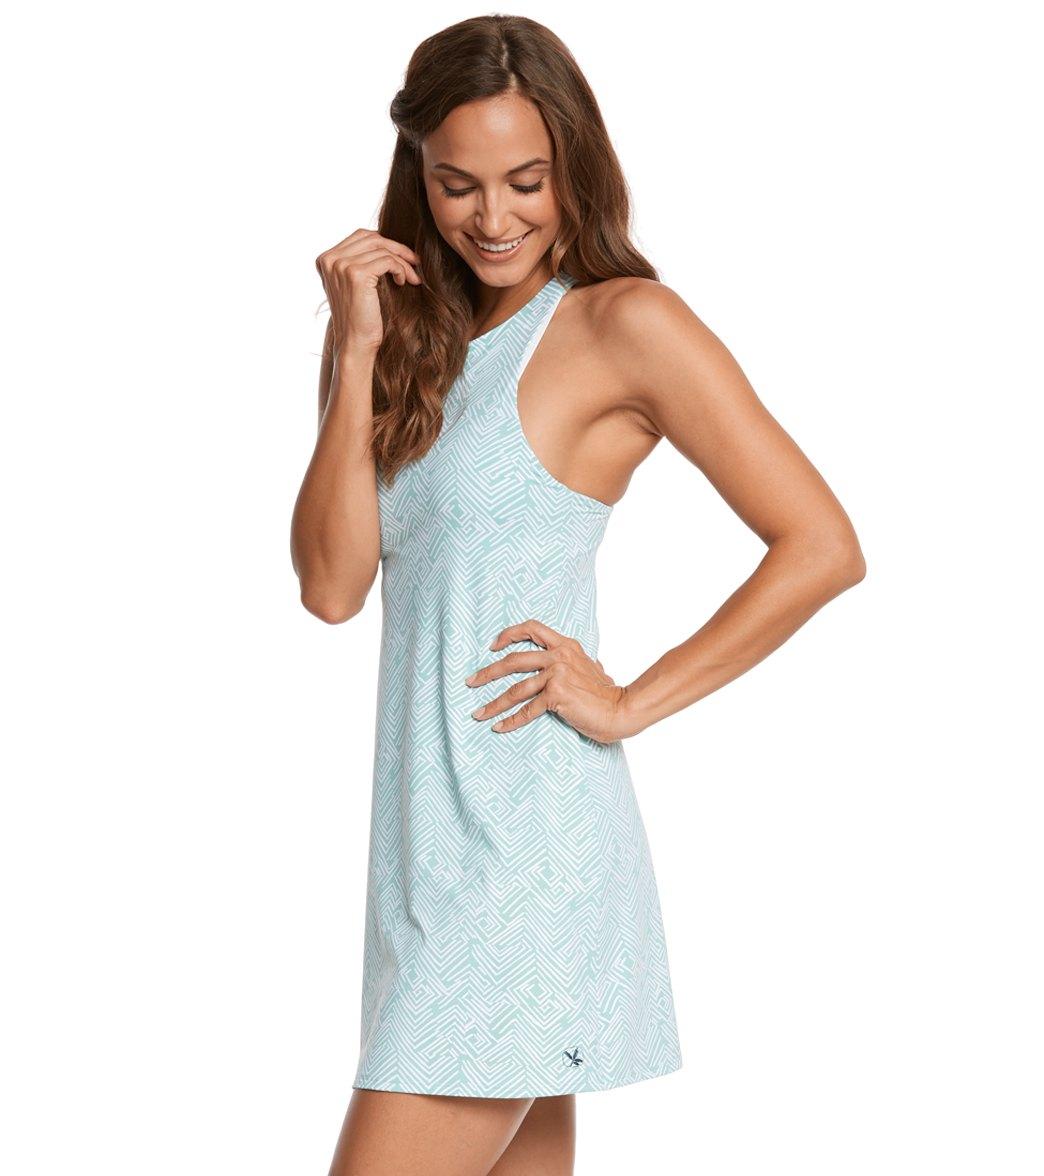 bf6c627a6293b Carve Designs Women's Sanitas Cover up Dress at SwimOutlet.com ...